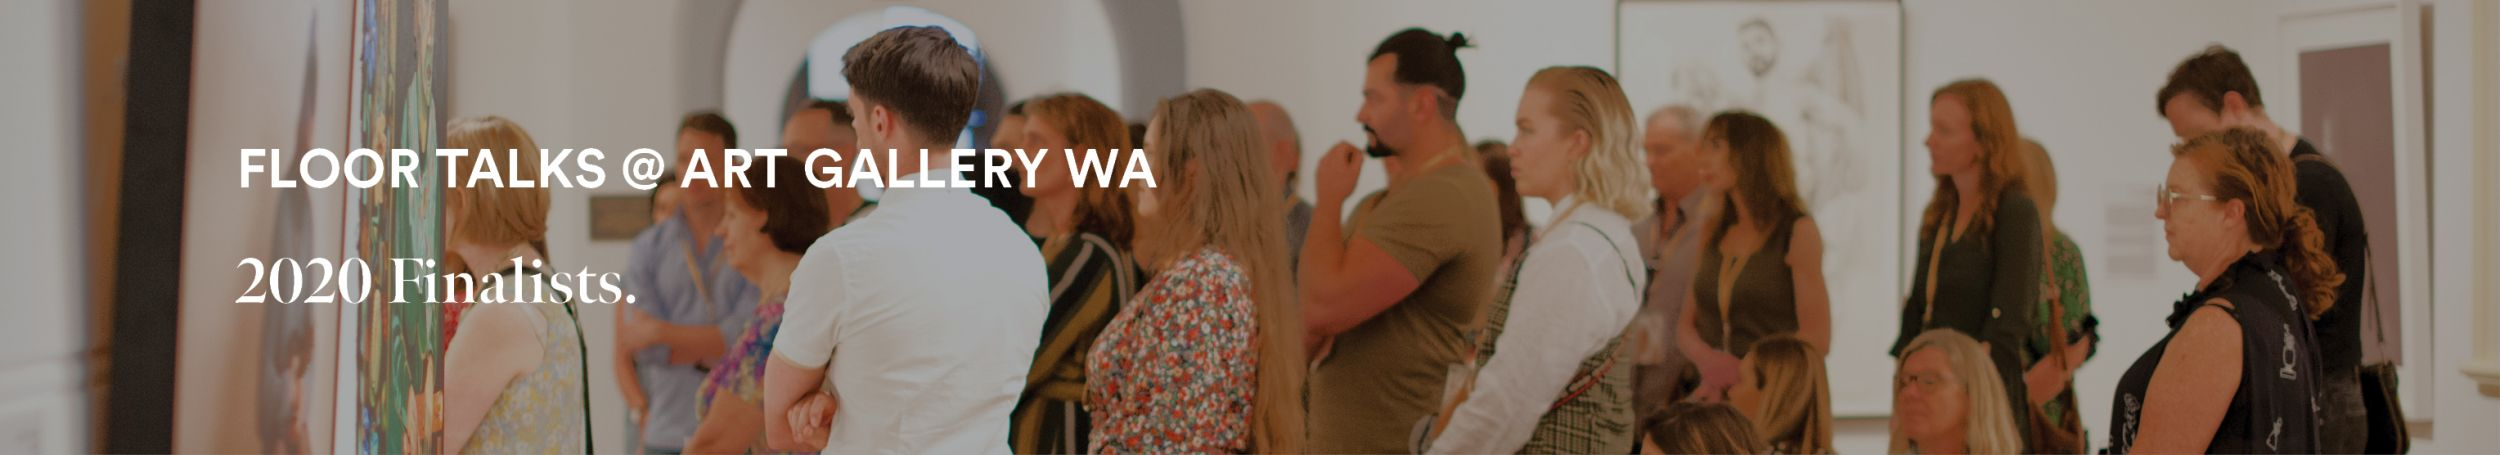 Artist Floor Talks | with AGWA's Associate Curator